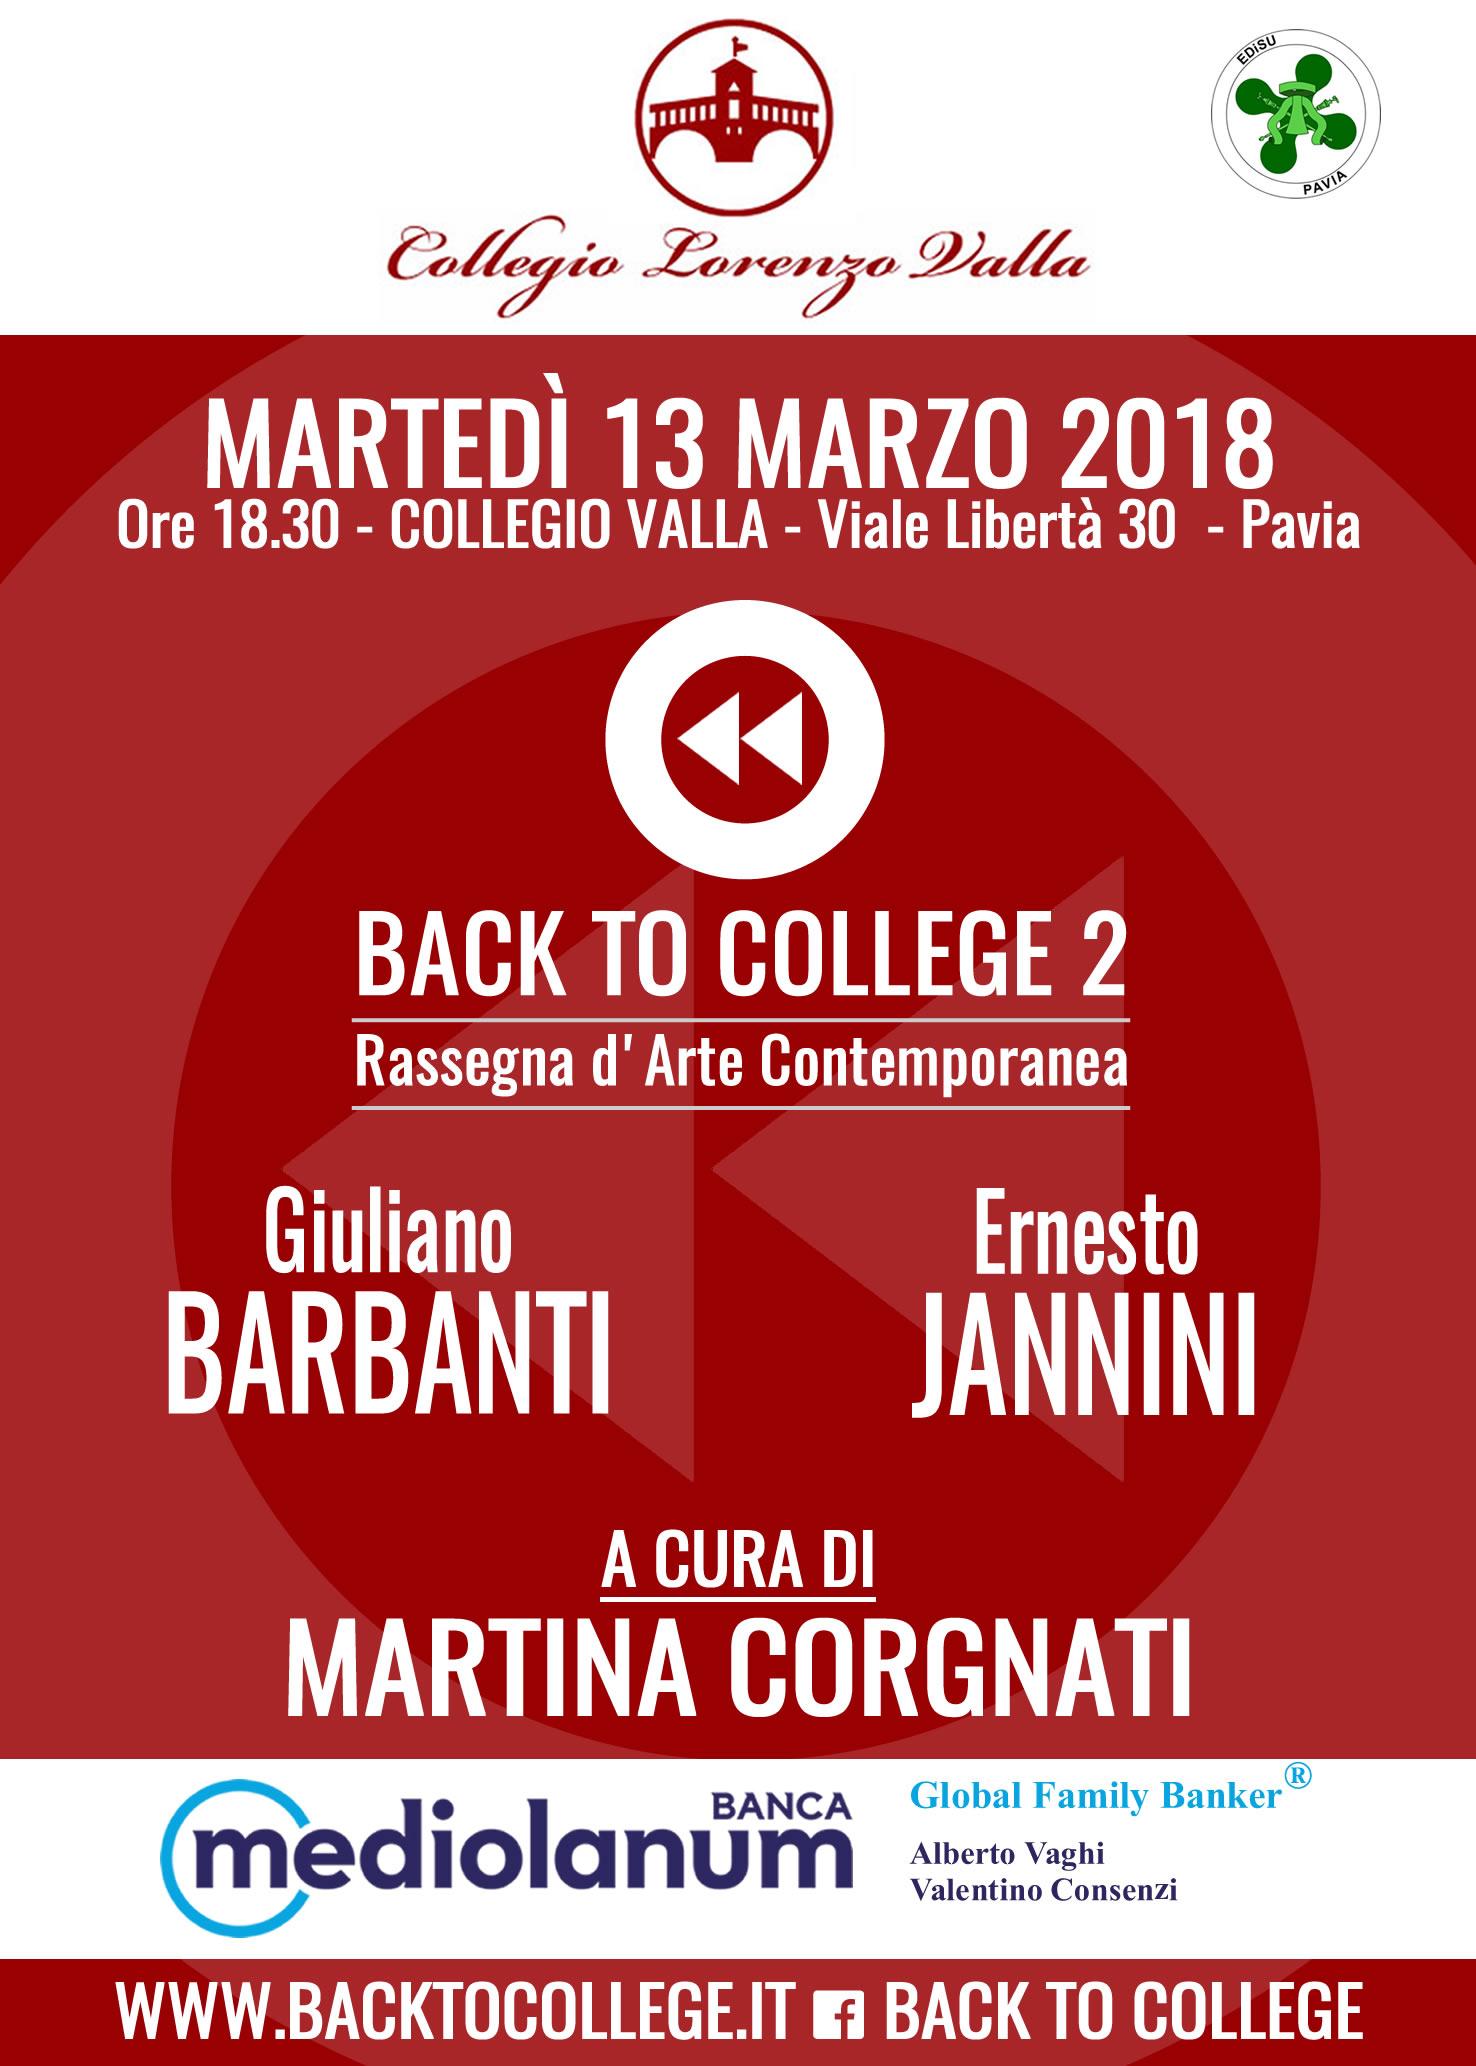 Locandina Back to College 2, 13 marzo 2018